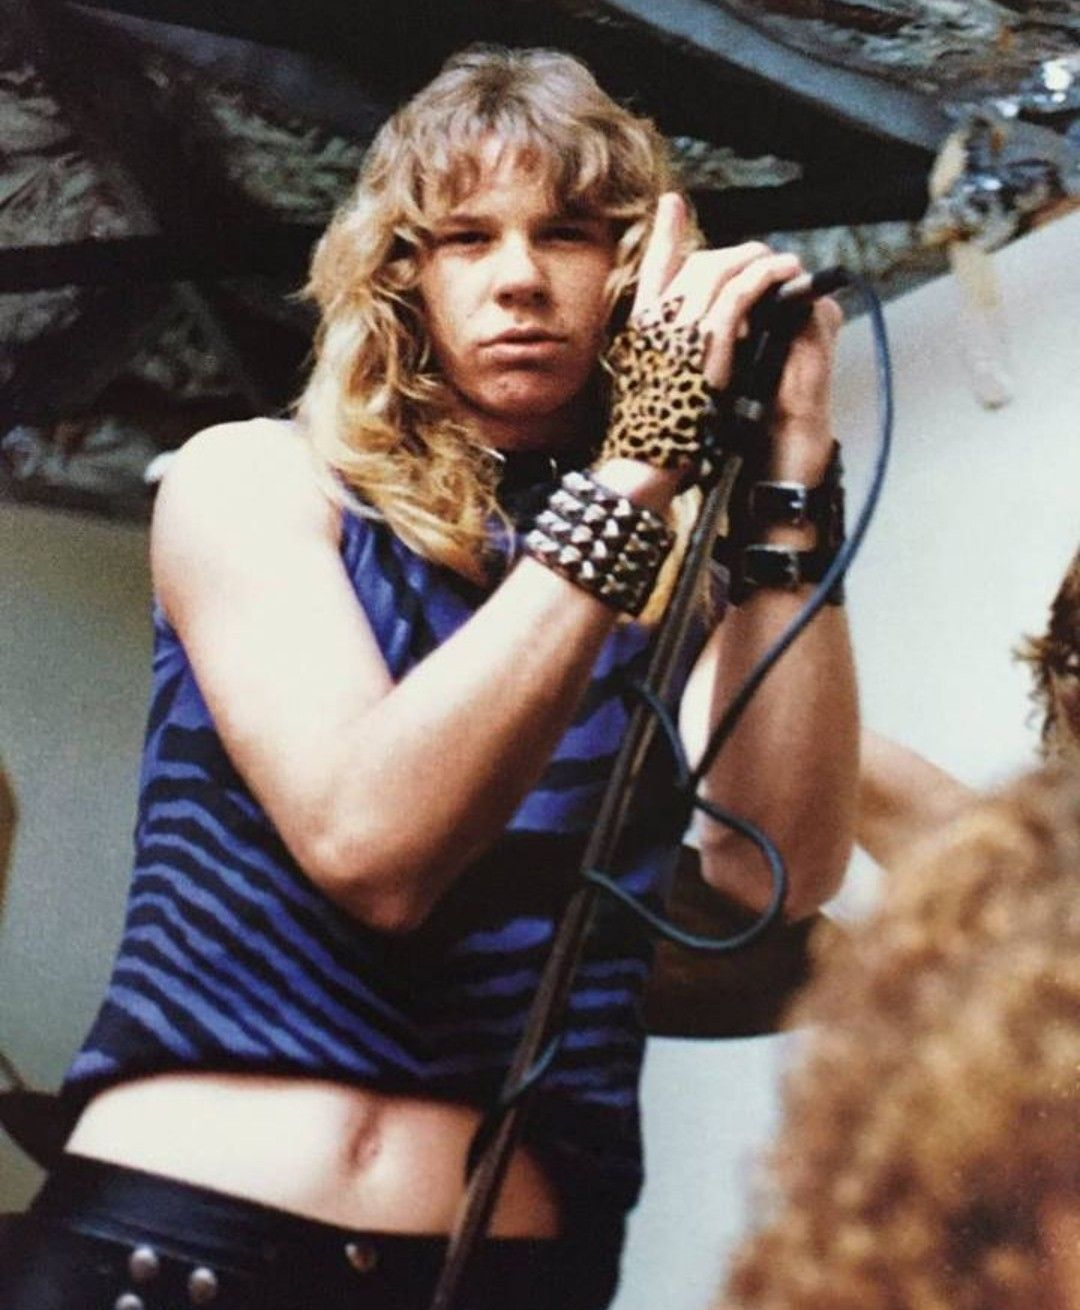 Fingerless gloves for musicians - Young James Hetfield Sporting A Leopard Fingerless Glove A Belly Shirt And A